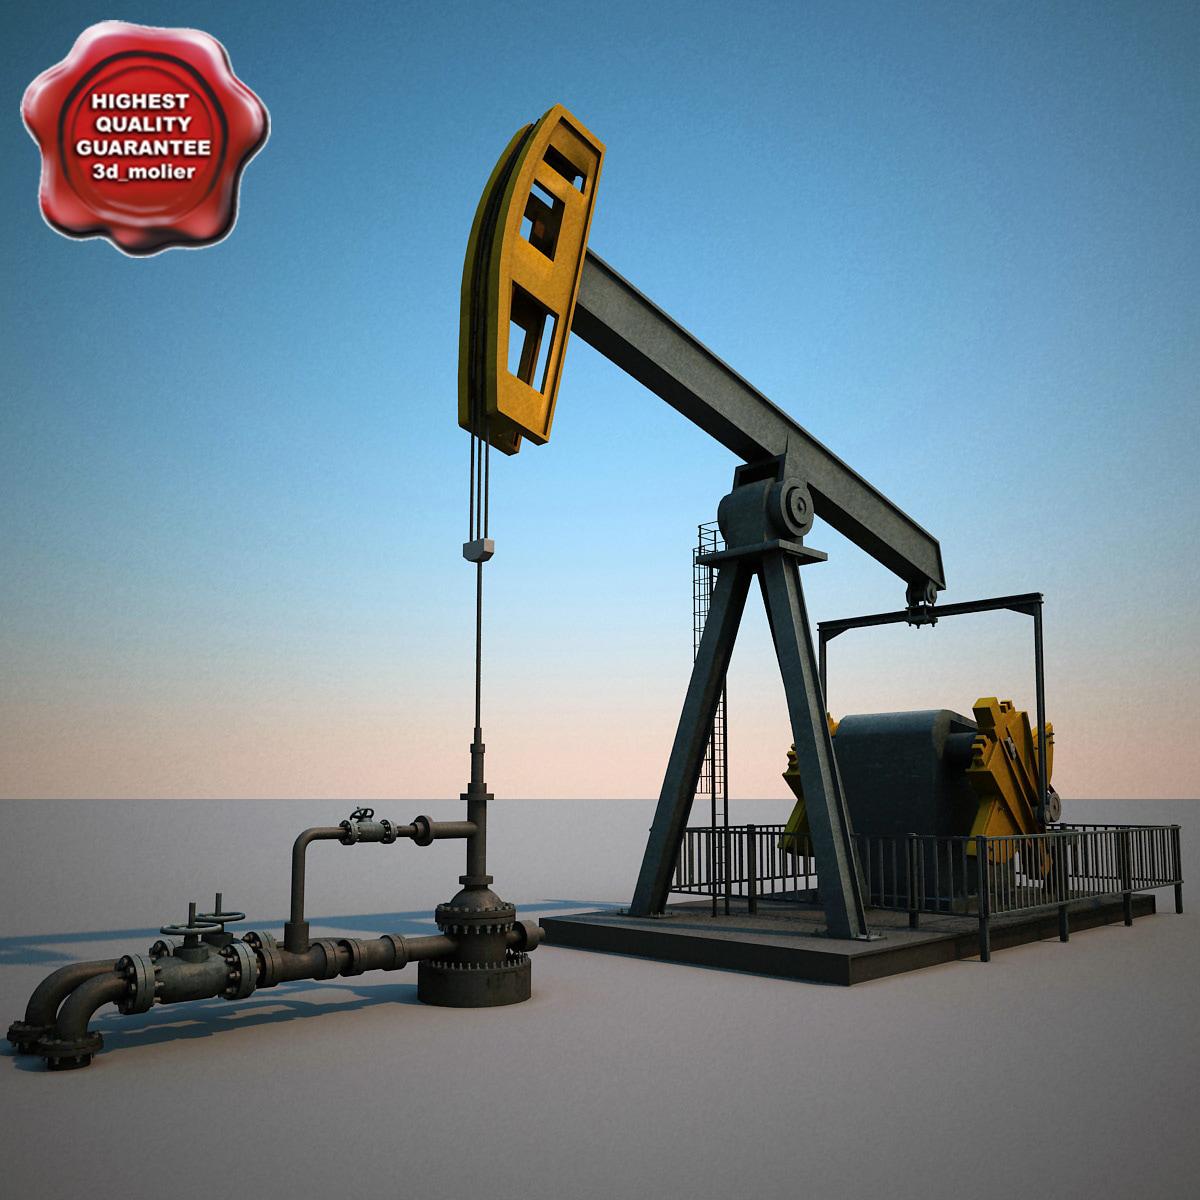 3d oil pump pumpjack